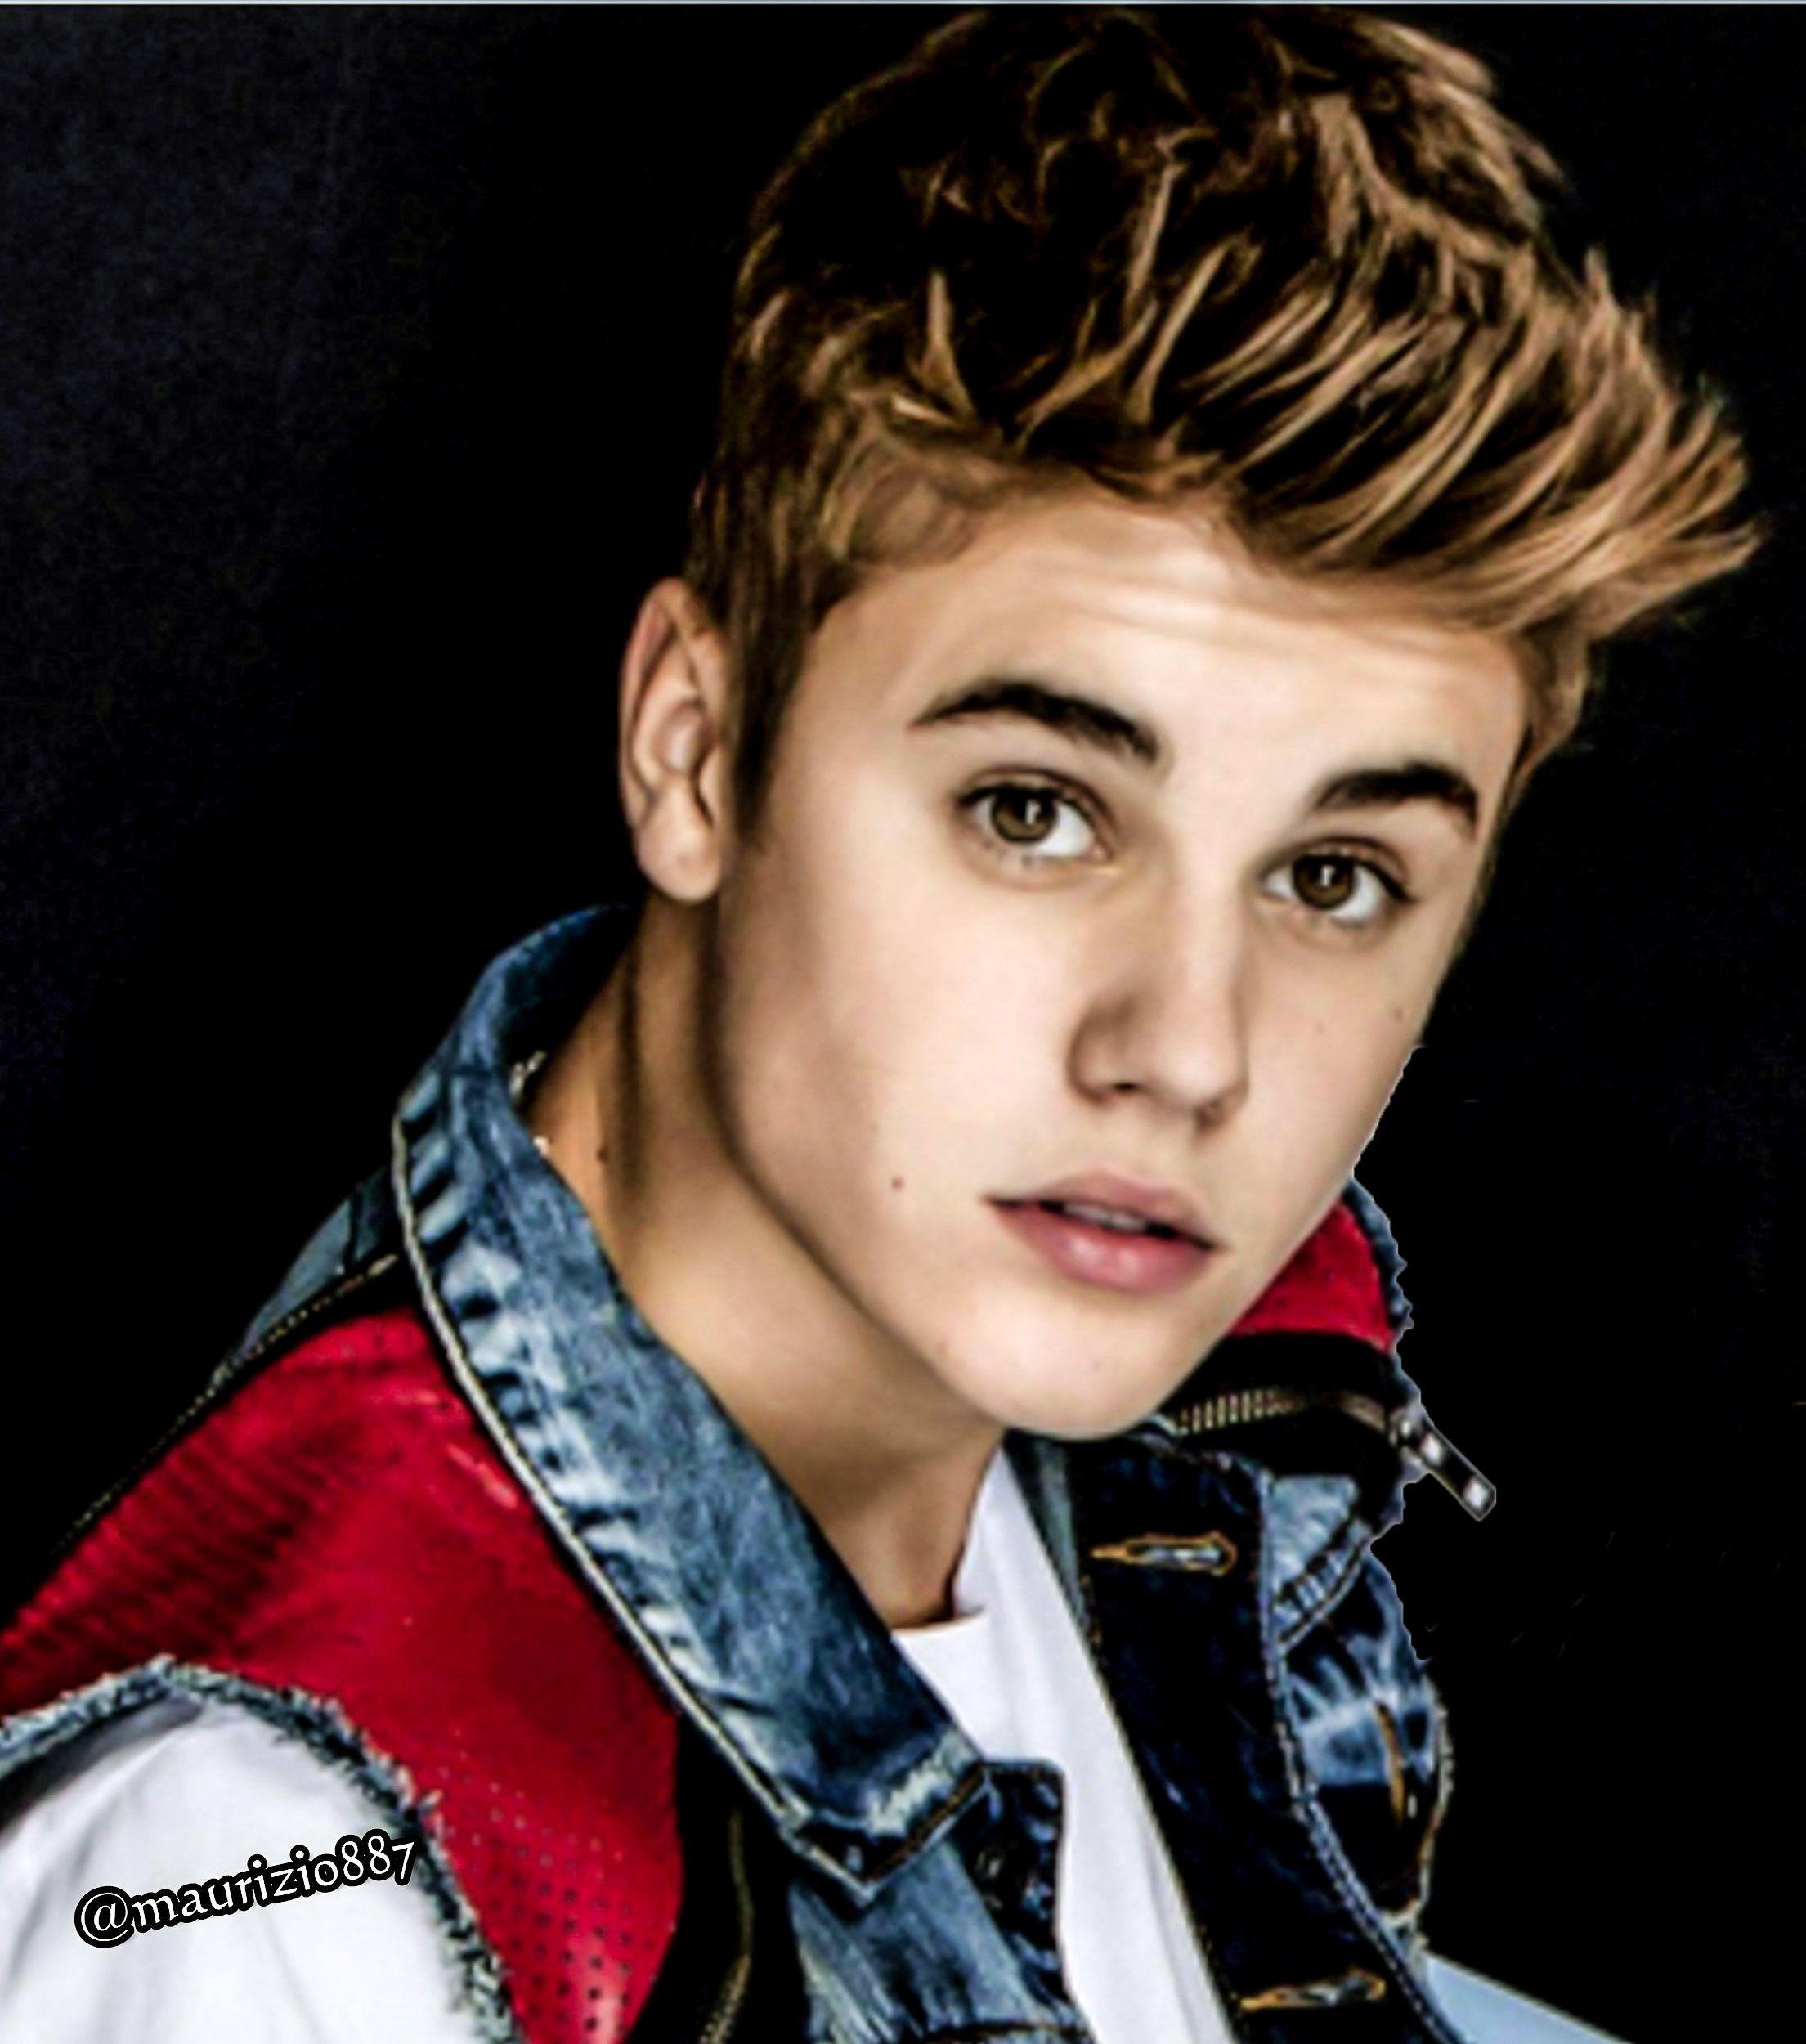 Justin Bieber Wallpapers Hd 2015 Justin Bieber 2015 Photoshoot Justin Bieber Wallpaper Justin Bieber Images